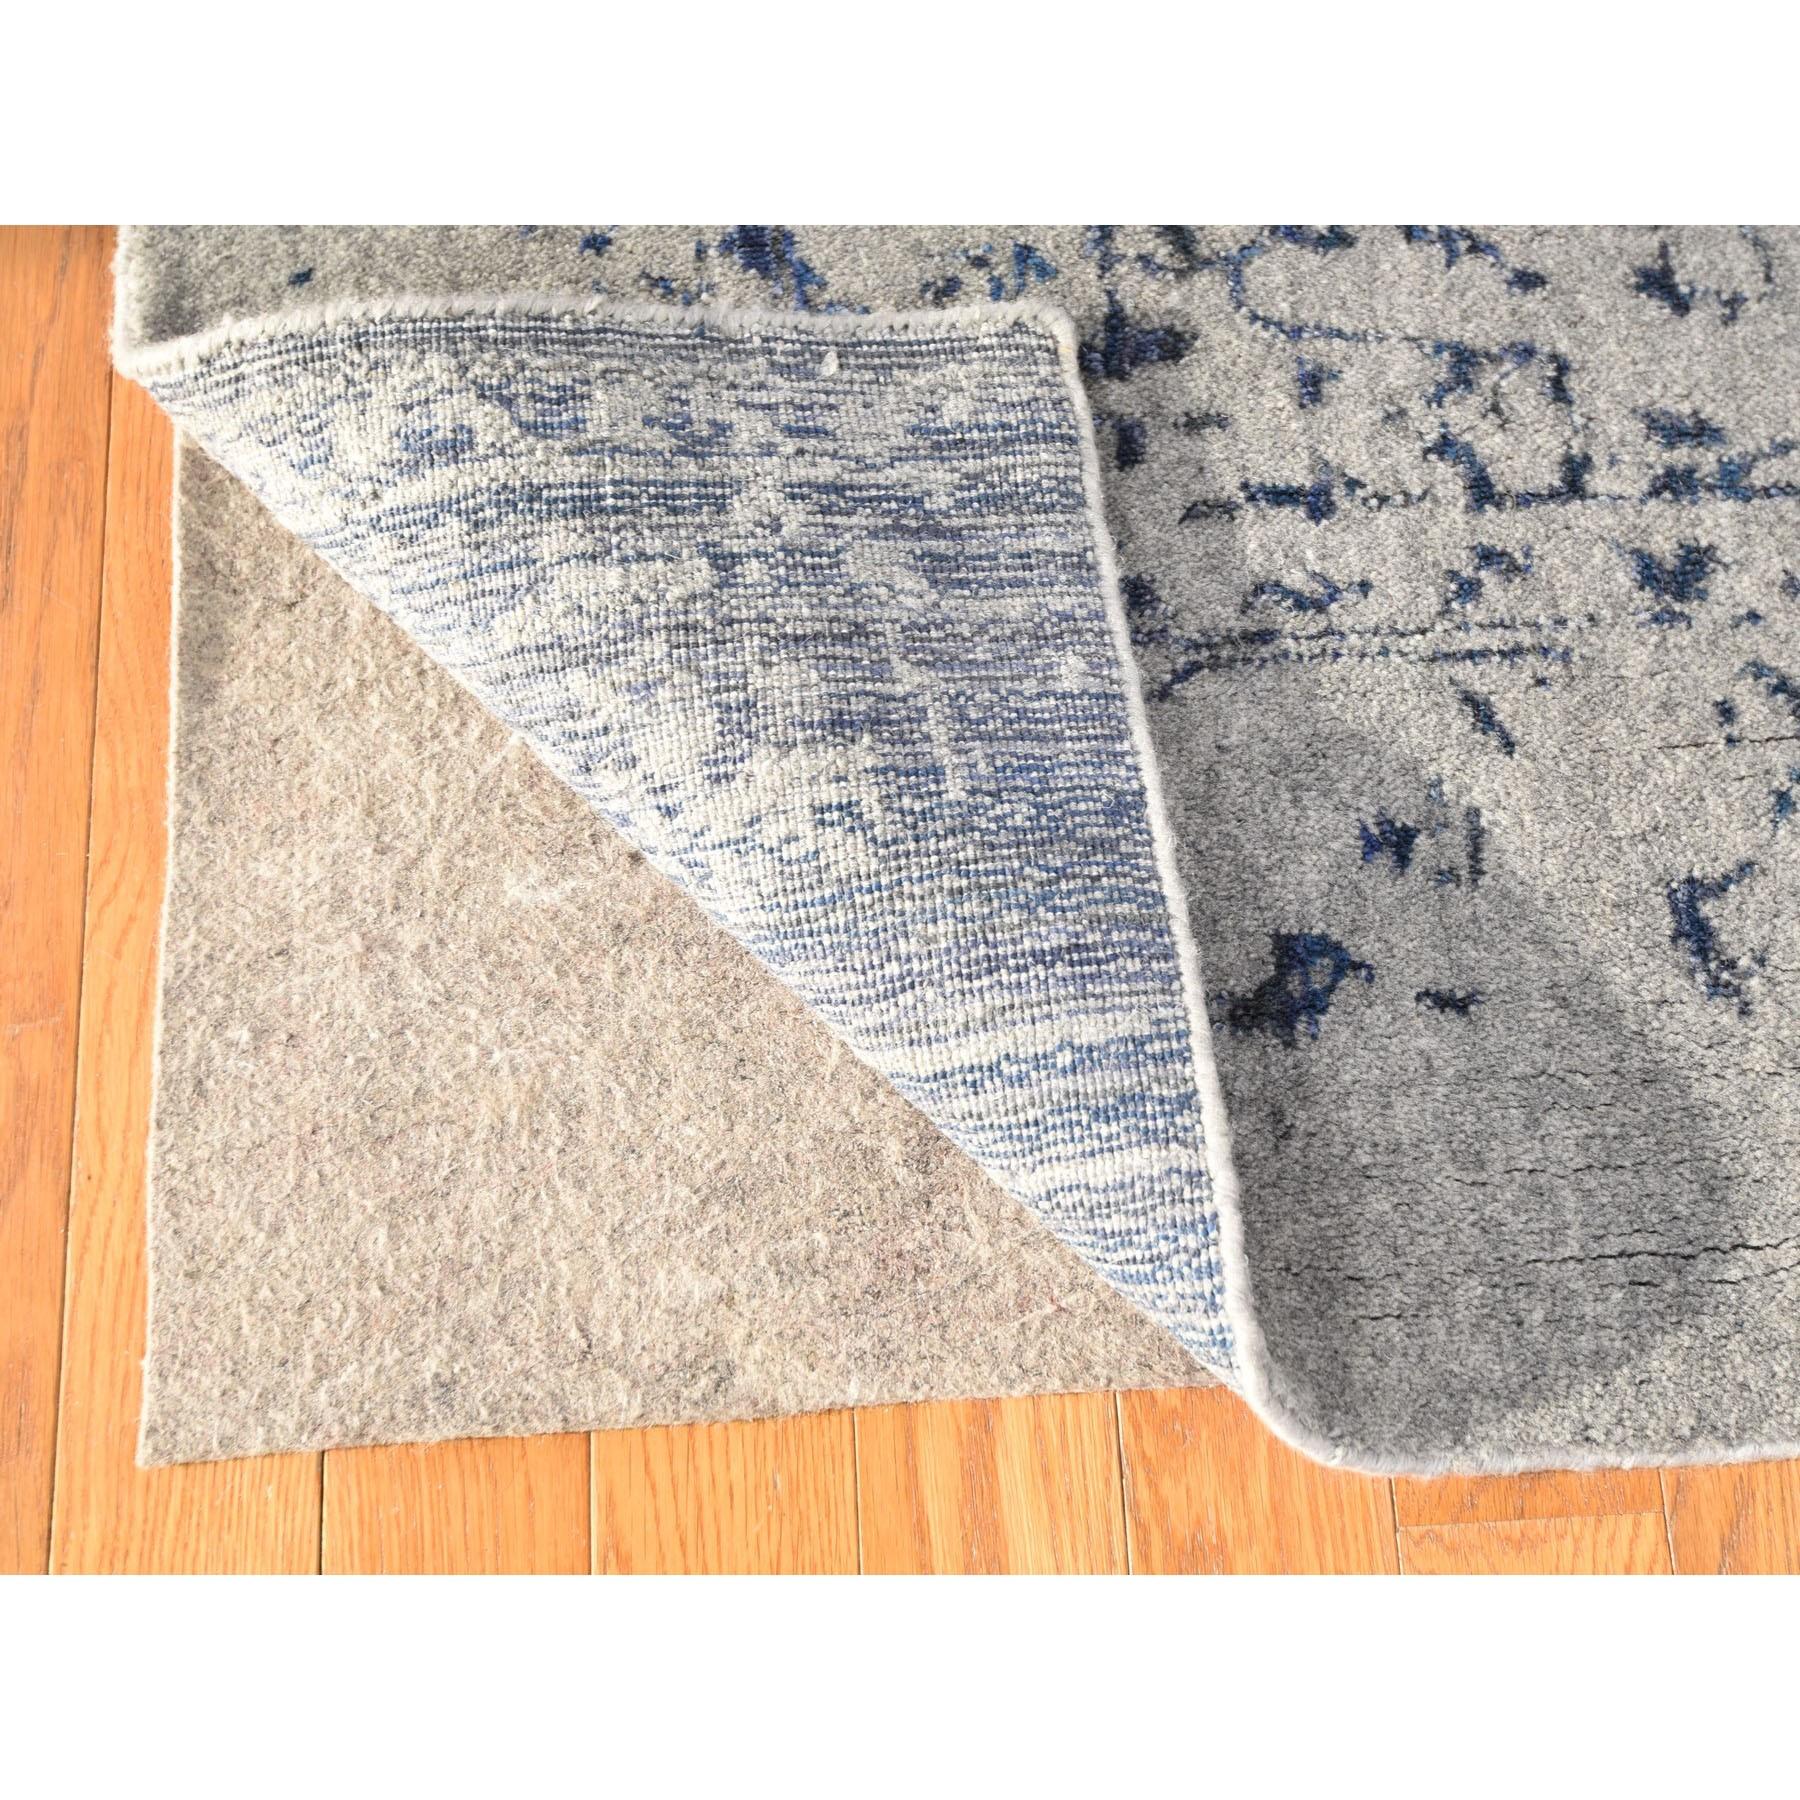 6'x9' jacquard Hand Loomed With Broken Persian Heriz Design Blue Oriental Rug